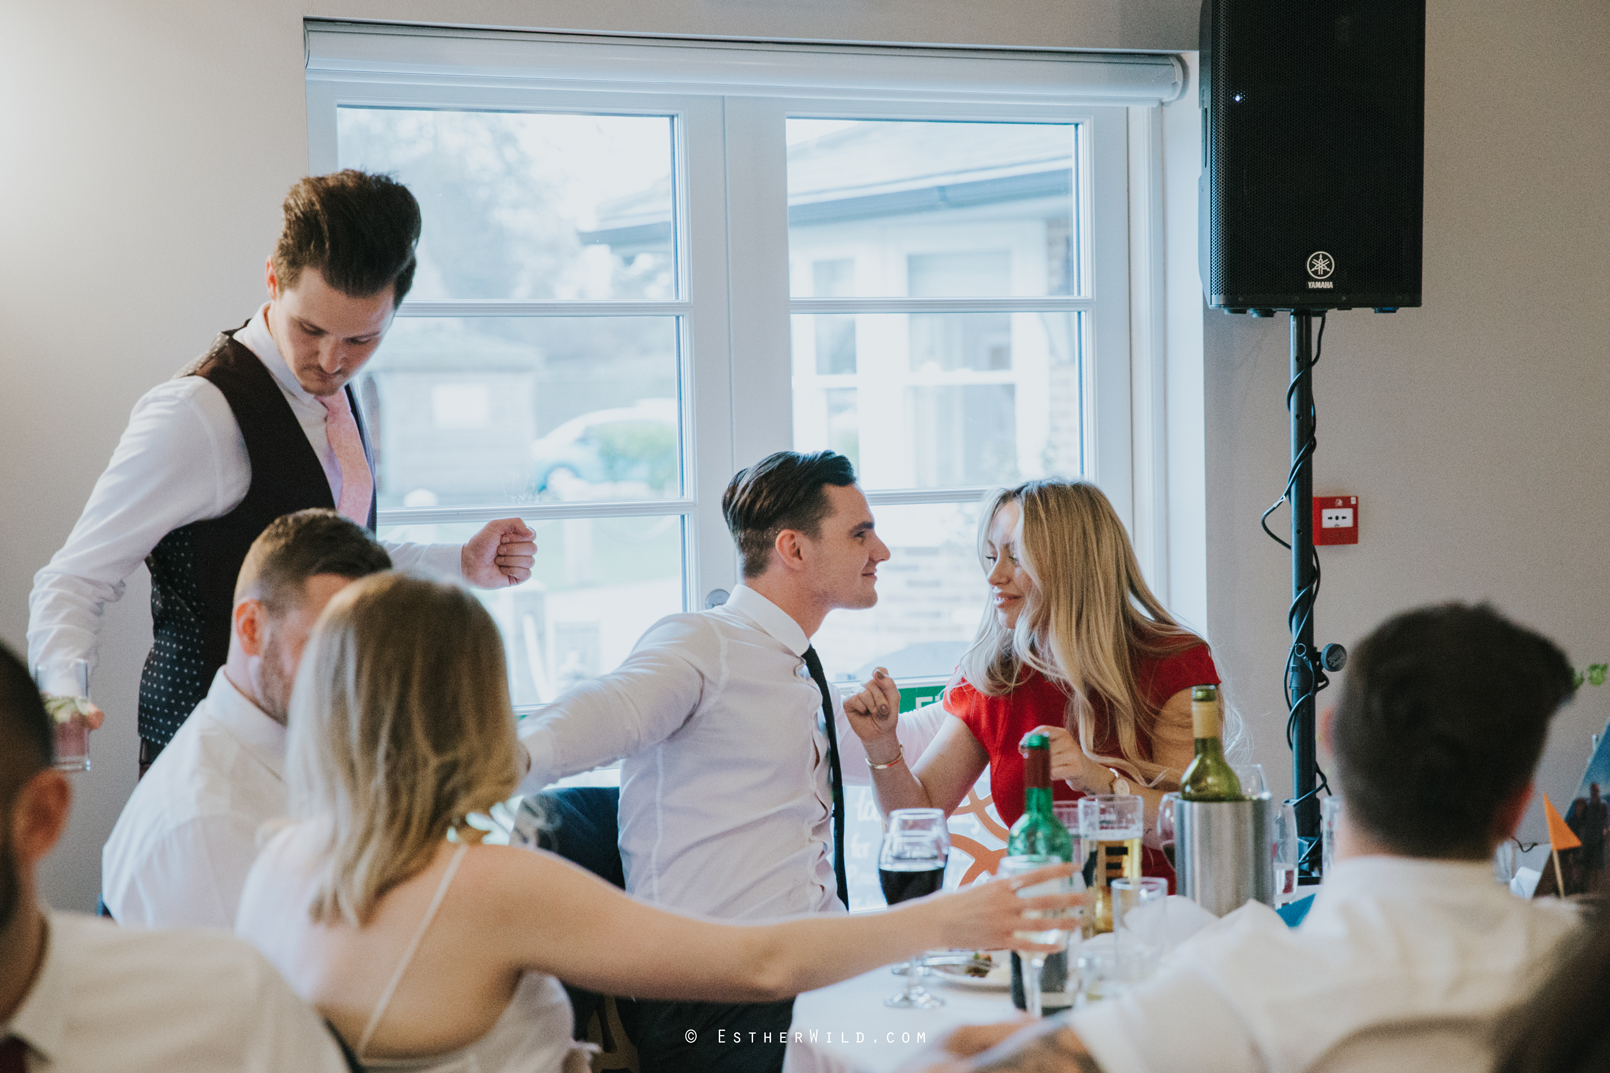 The_BoatHouse_Wedding_Venue_Ormesby_Norfolk_Broads_Boat_Wedding_Photography_Esther_Wild_Photographer_IMG_2698.jpg